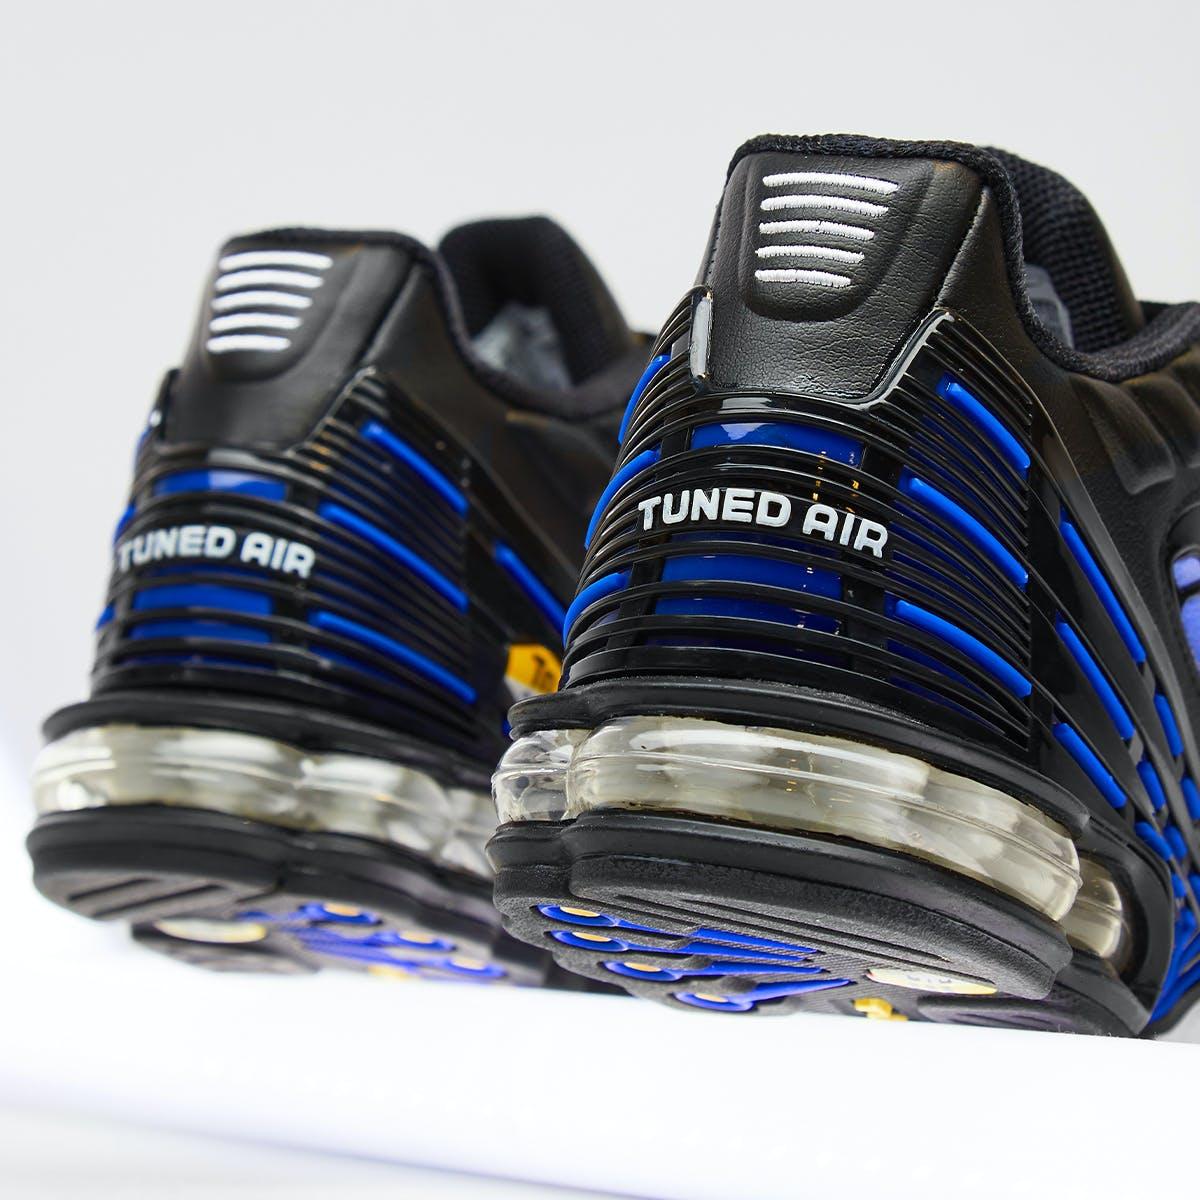 Nike Air Max Plus III - CJ9684-001